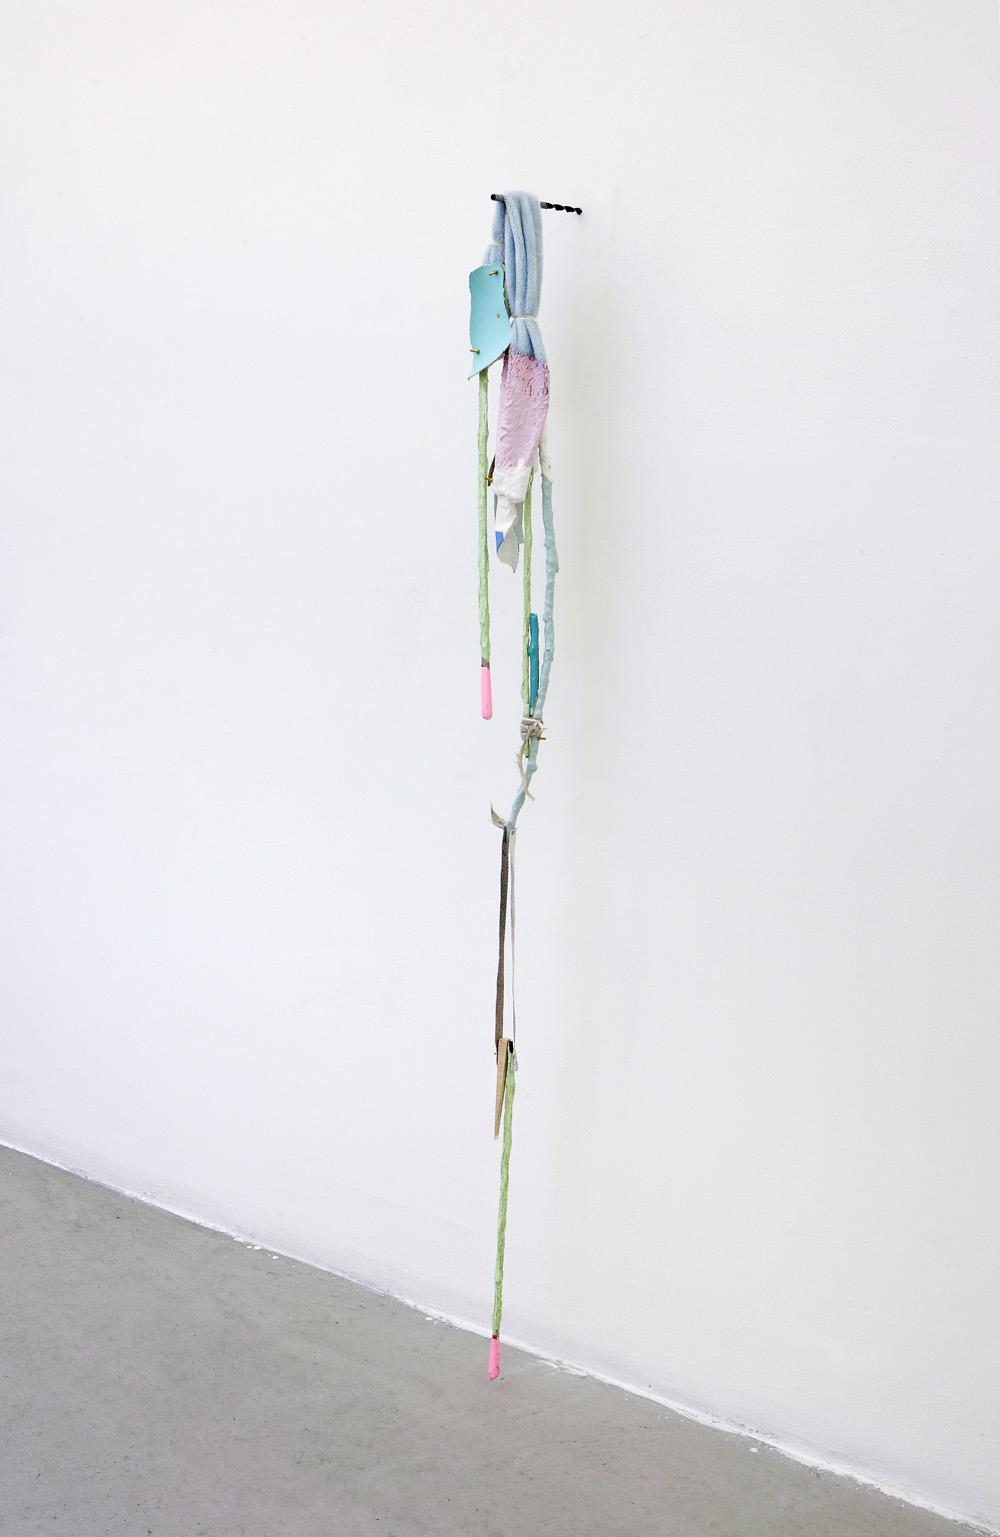 Suspenso, 2011, mixed media, 158 x 12 x 17 cm